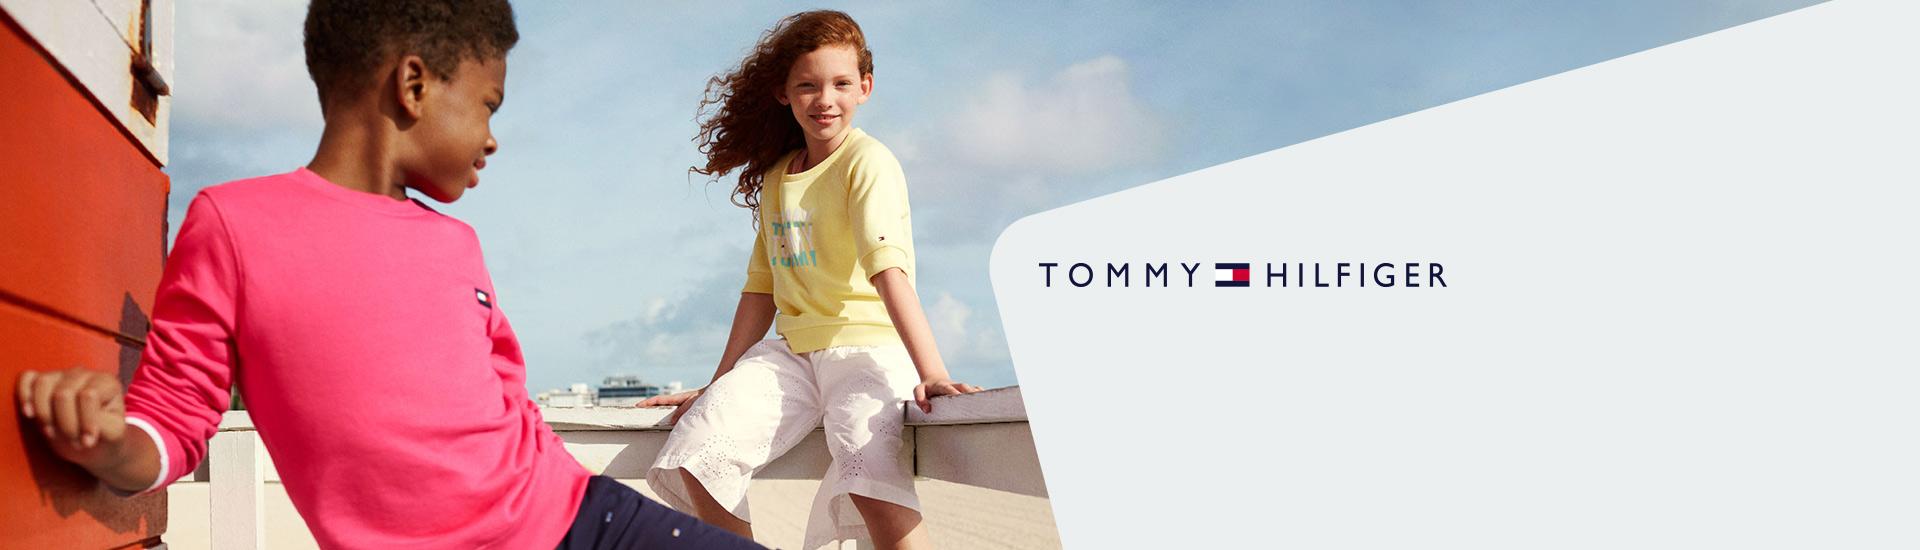 TommyHilfiger